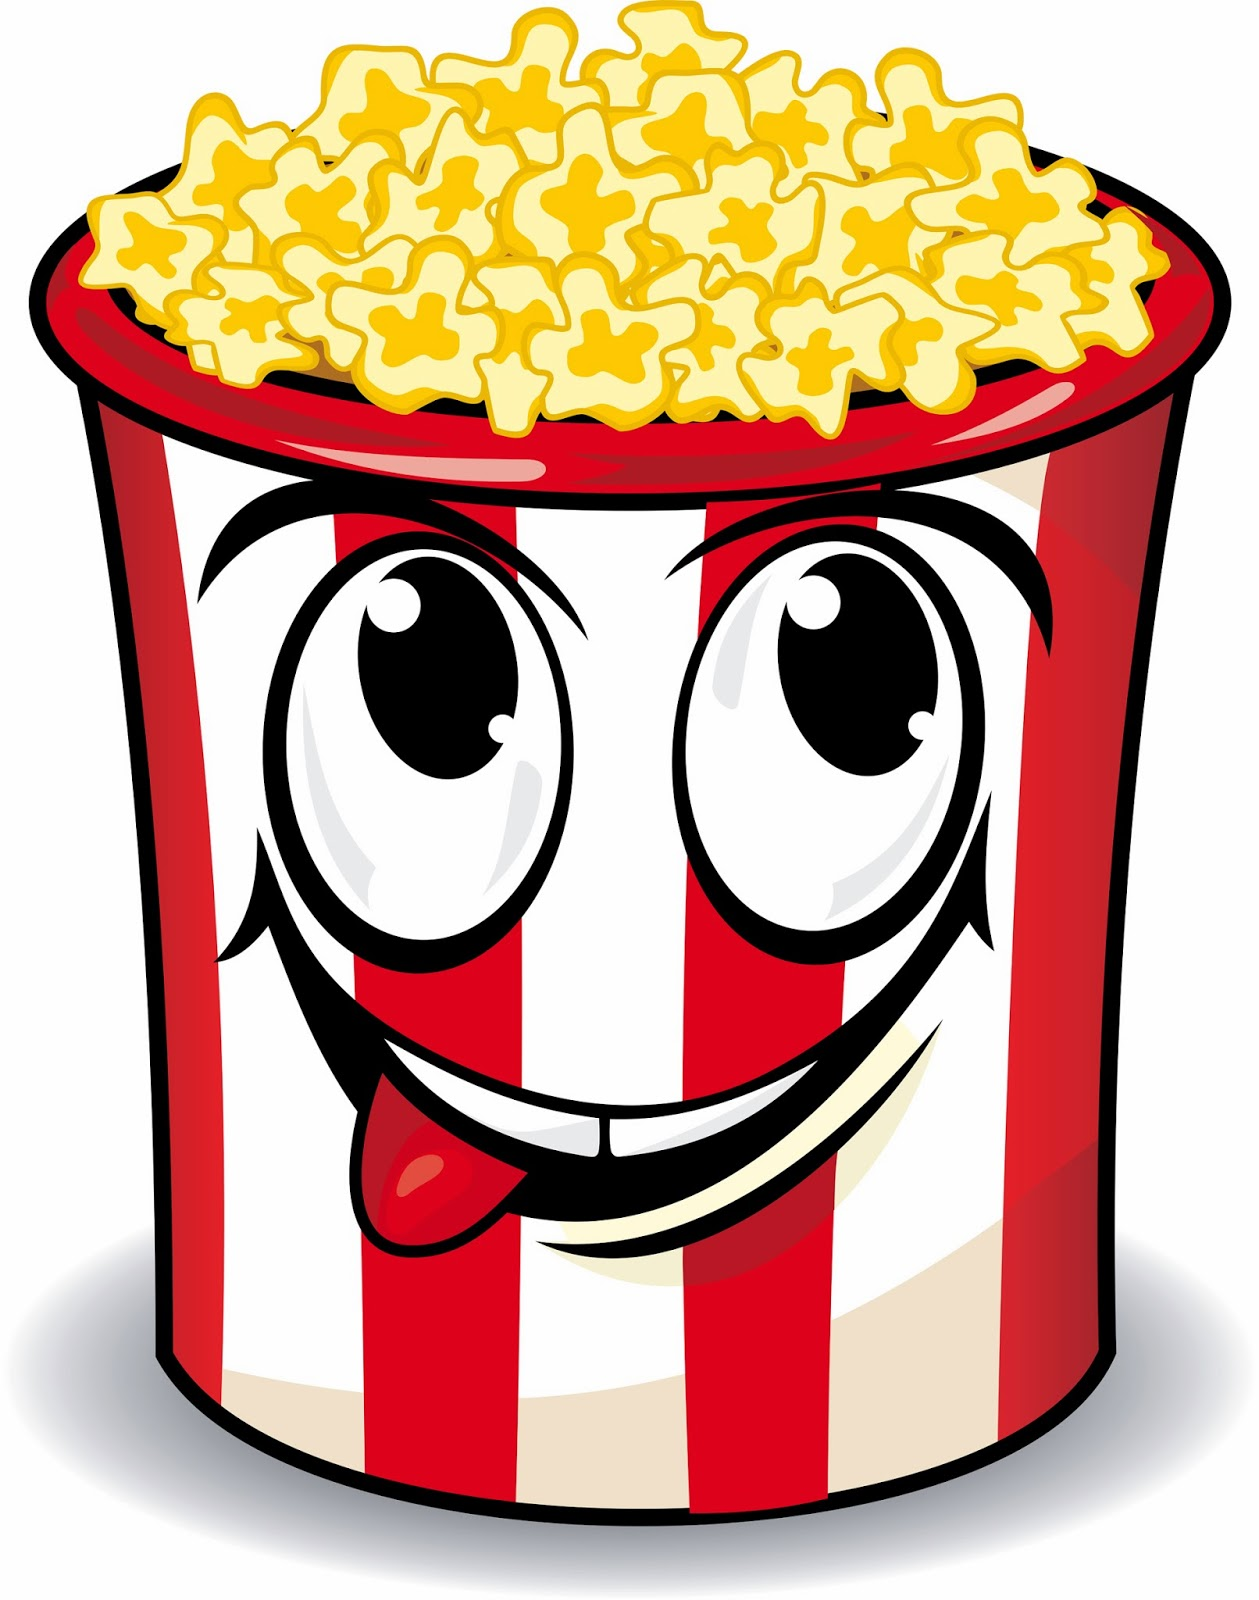 1259x1600 Carnival Clipart Popcorn Bowl